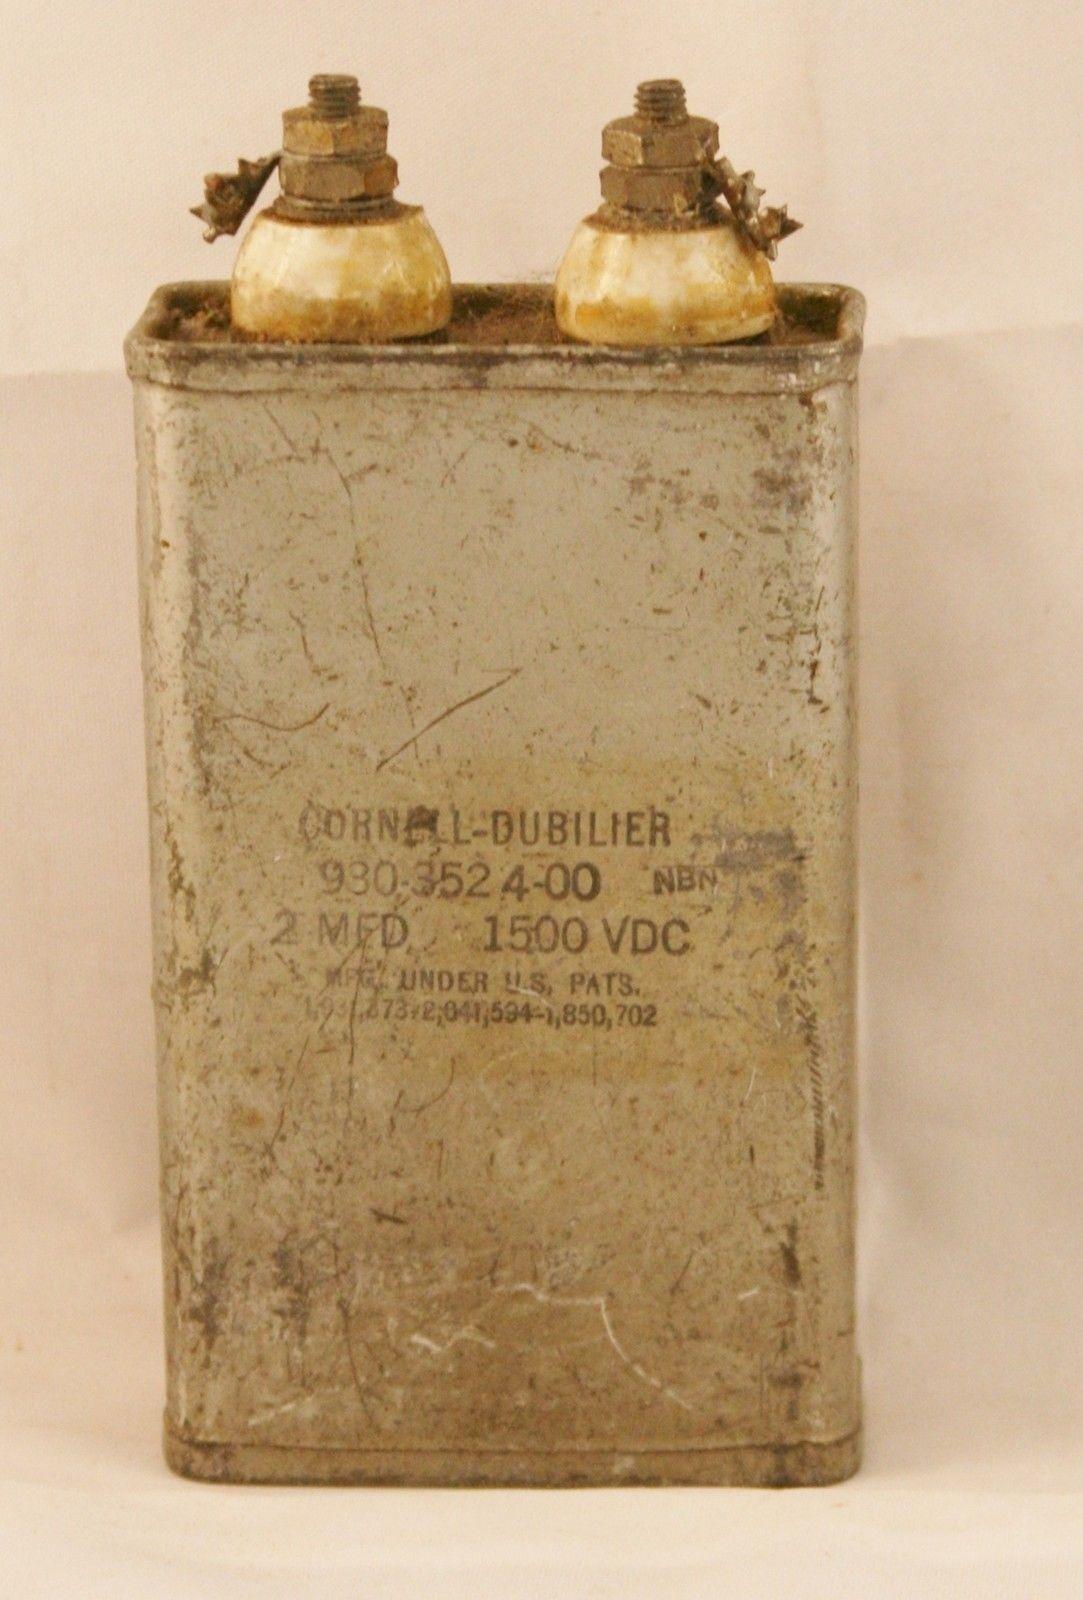 Großer Cornell-Dubilier 2uf 2 Mfd 1500 Vdc 1.5 Kw Pio Kondensator